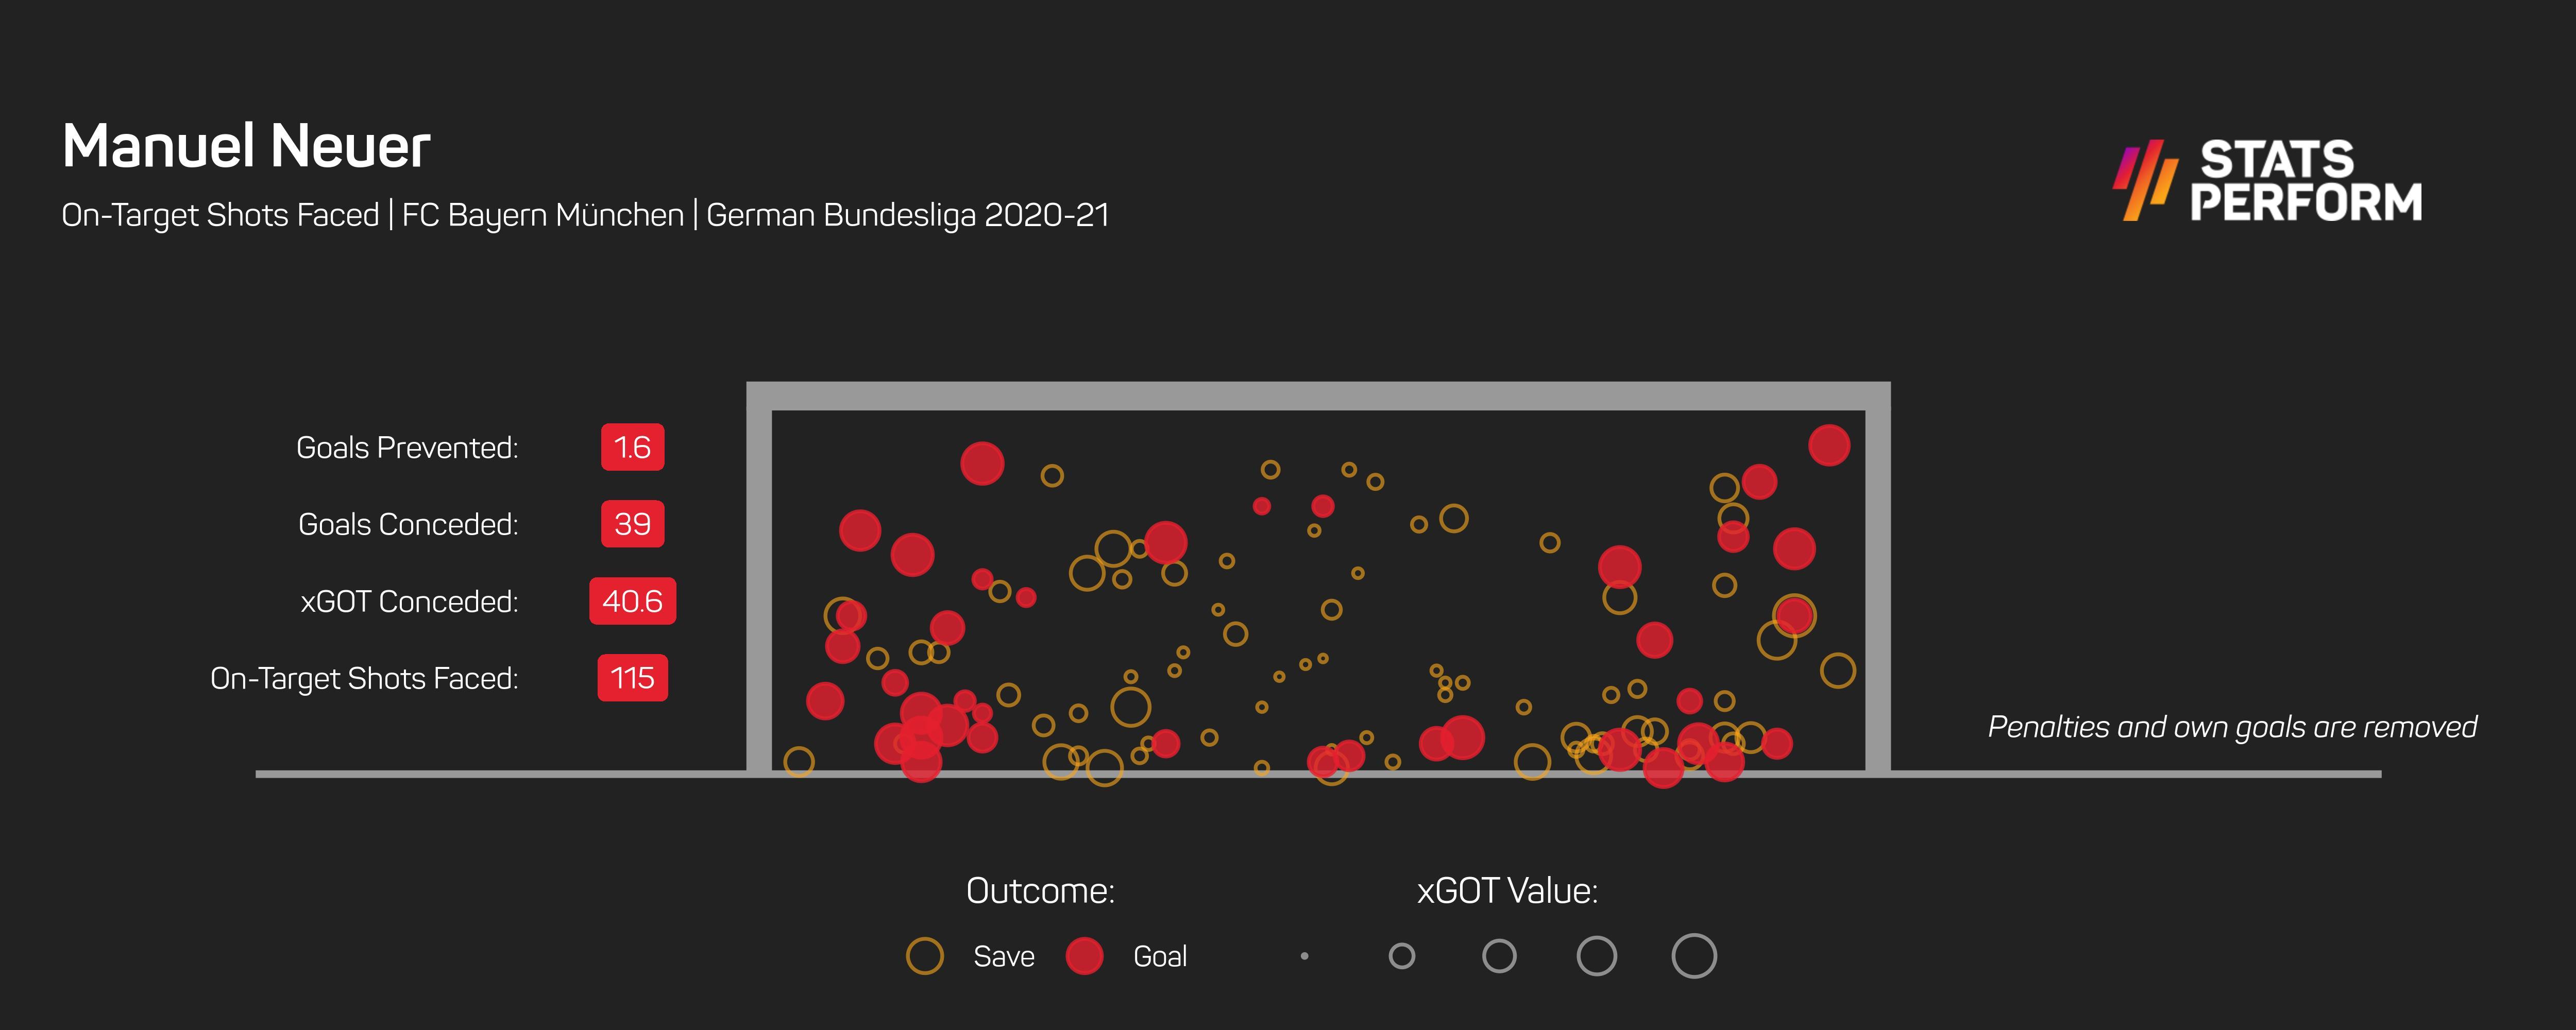 Manuel Neuer xGOT Bundesliga 2020-21